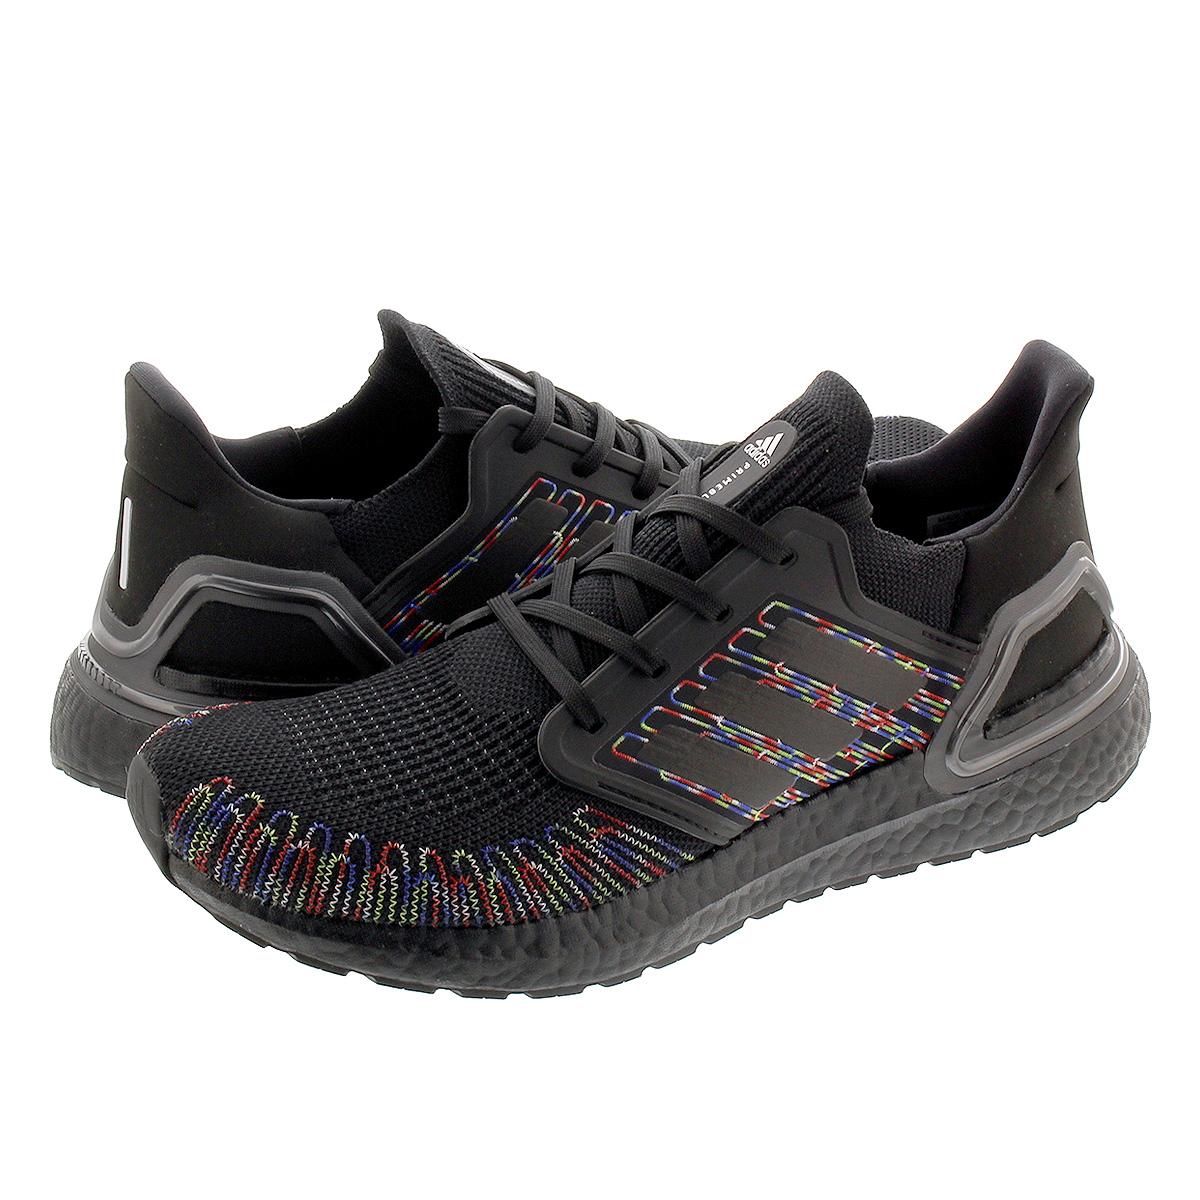 adidas ULTRABOOST 20 アディダス ウルトラブースト 20 CORE BLACK/CORE BLACK/SIGNAL GREEN eg0711